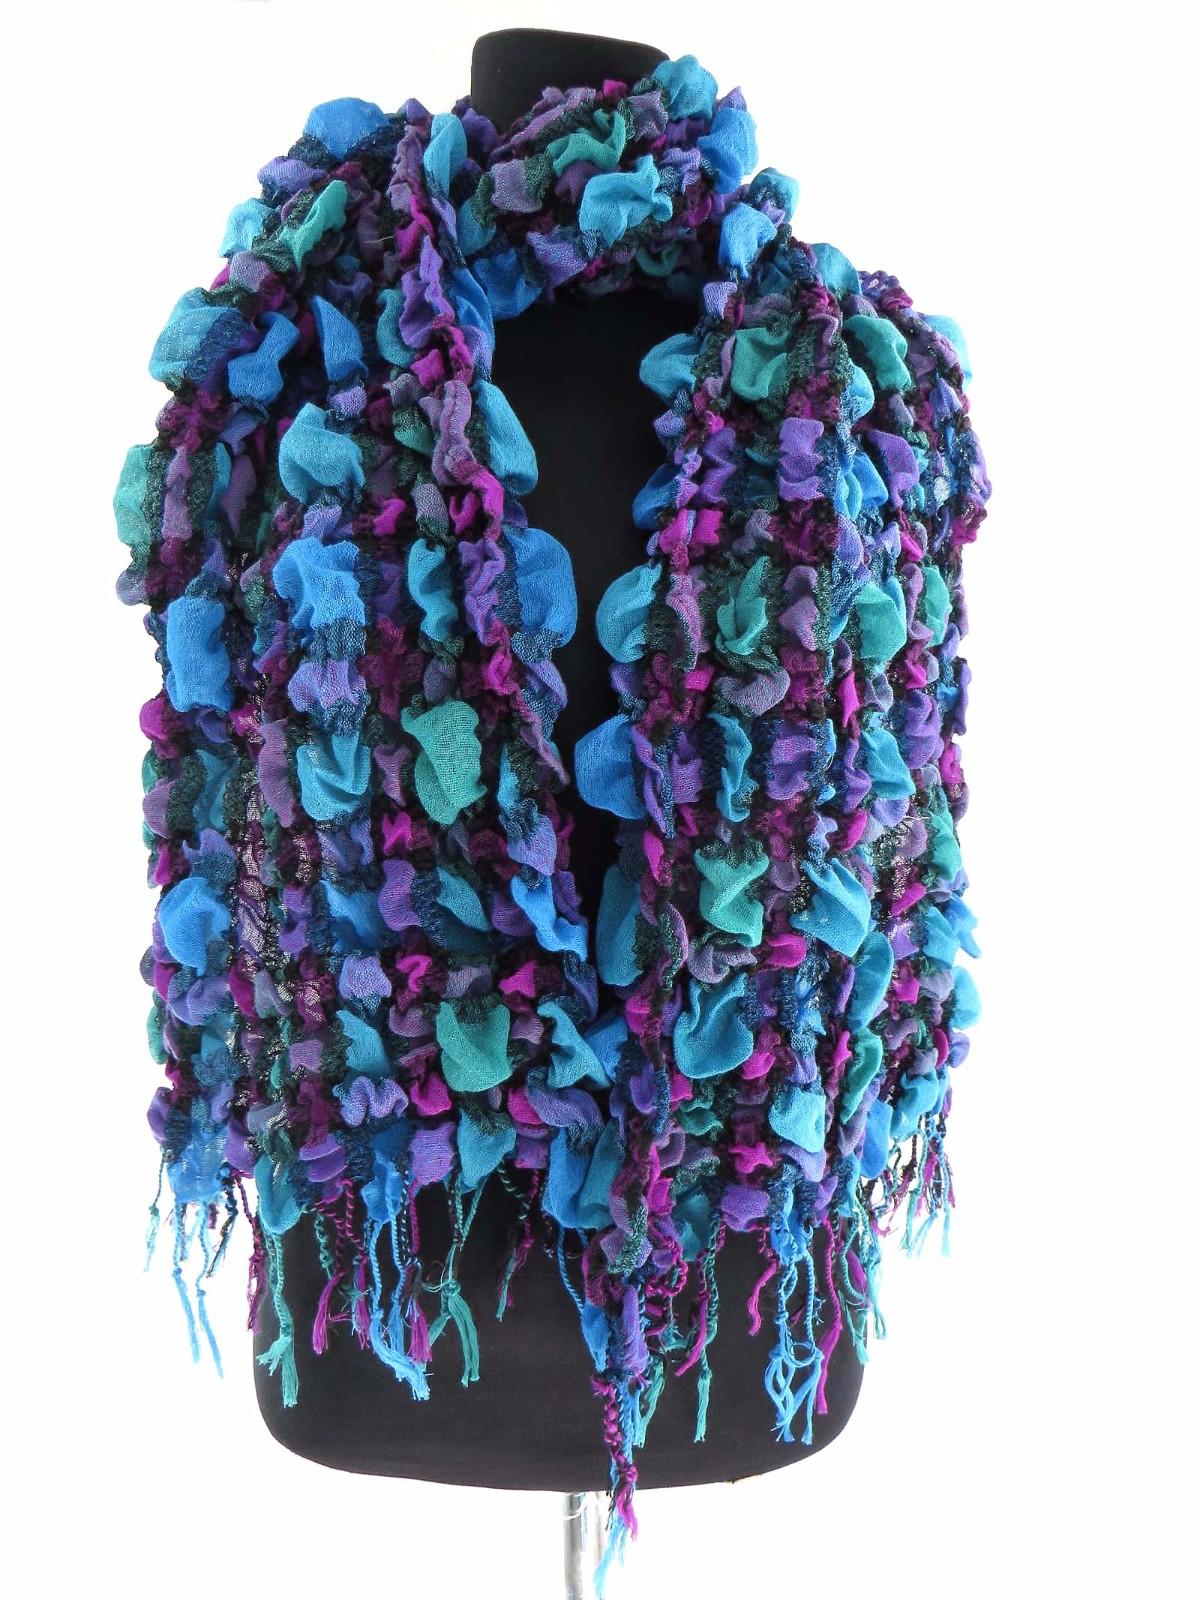 US SELLER-12 pcs bulk lot floral winter Long neckwarmer Scarf wholesale shawls